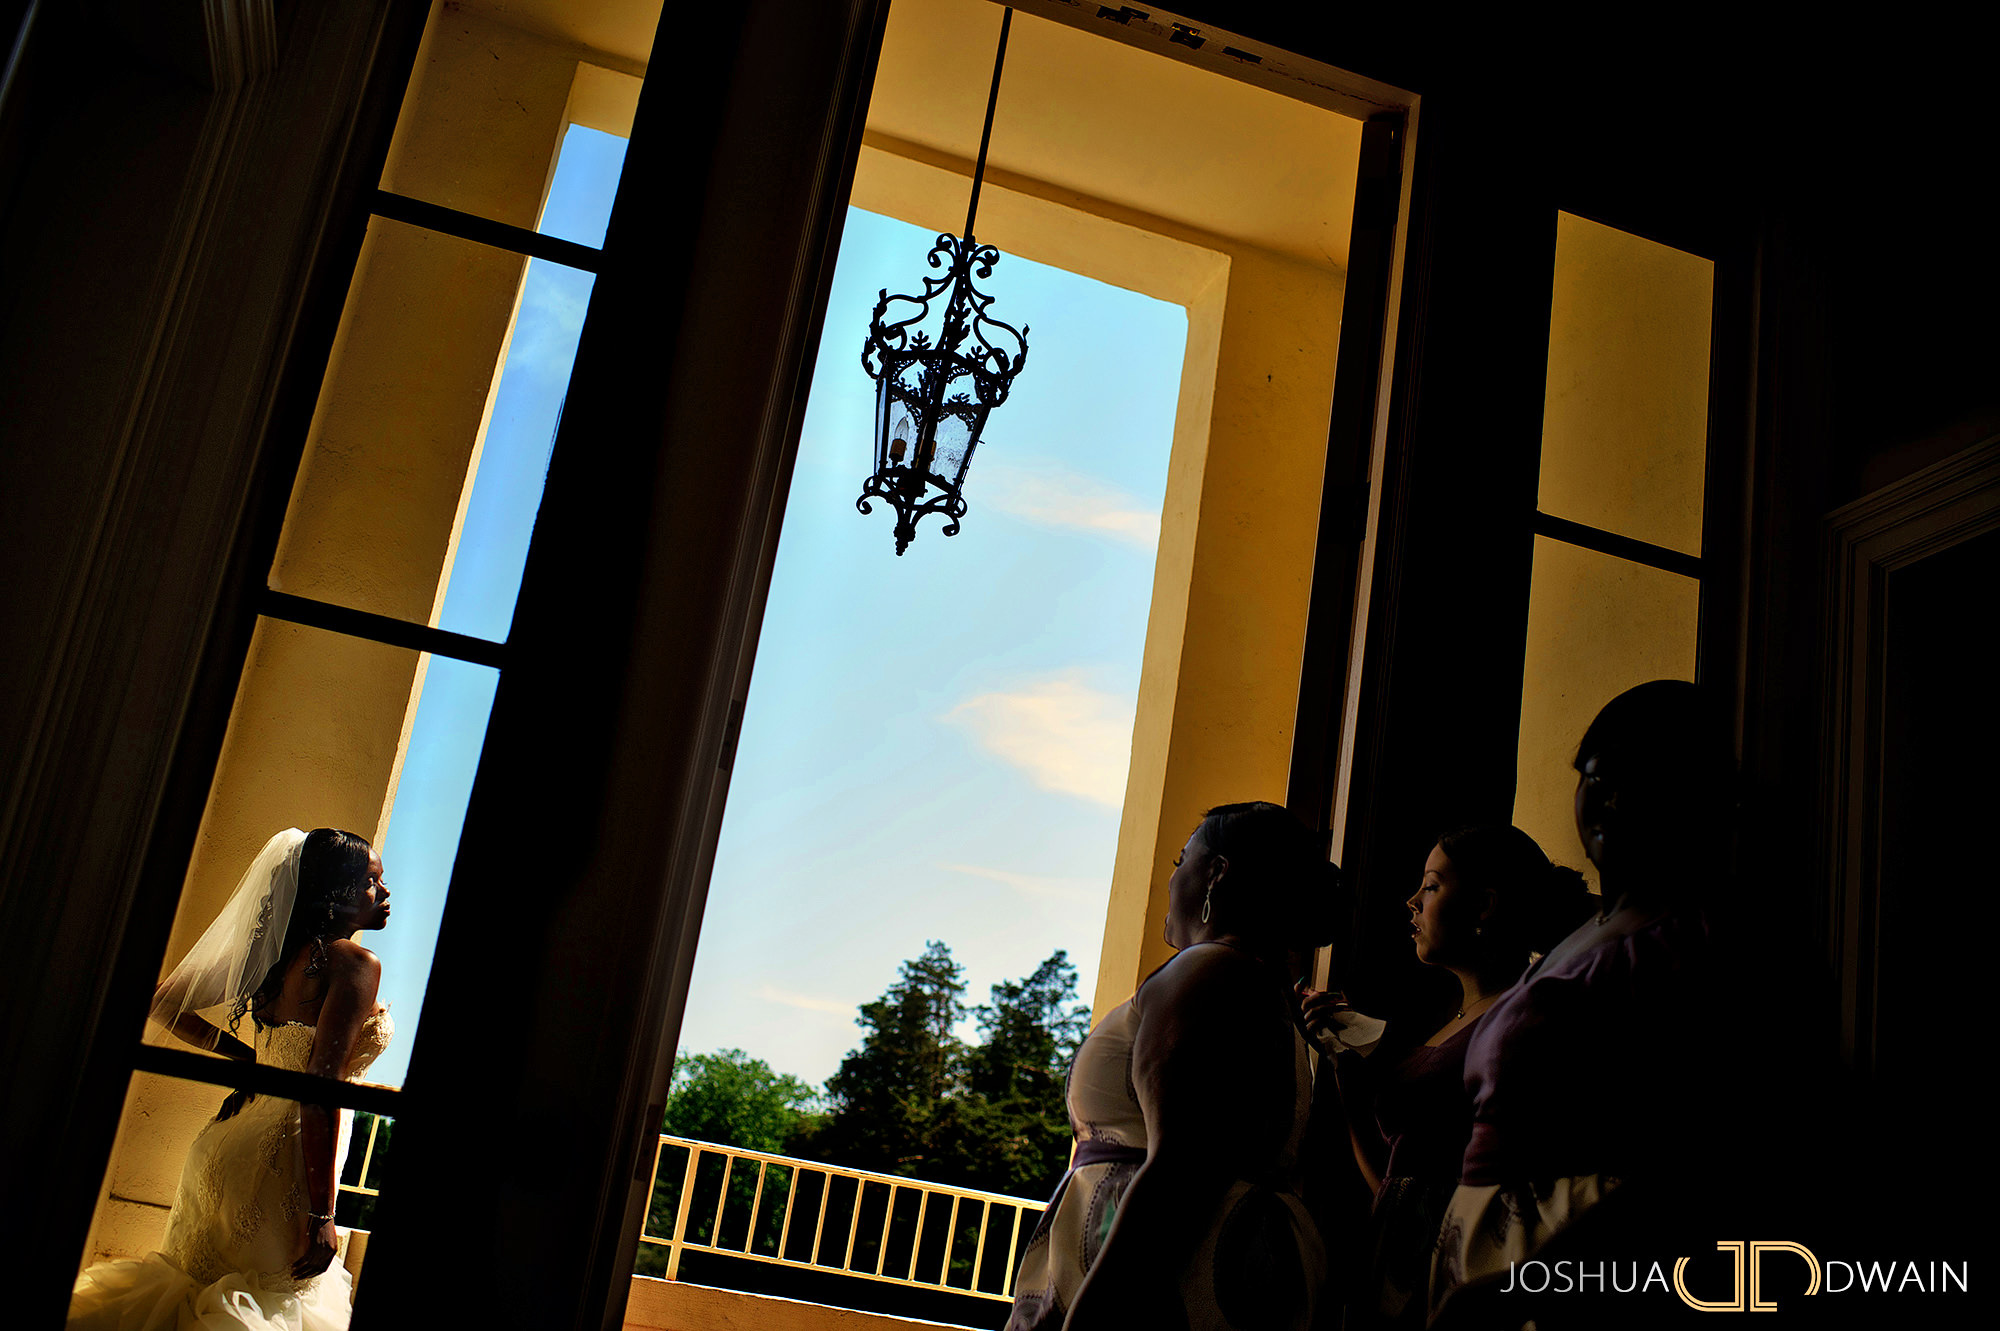 nancy-jason-003-wadsworth-estates-middletown-ct-wedding-photographer-joshua-dwain-photography-